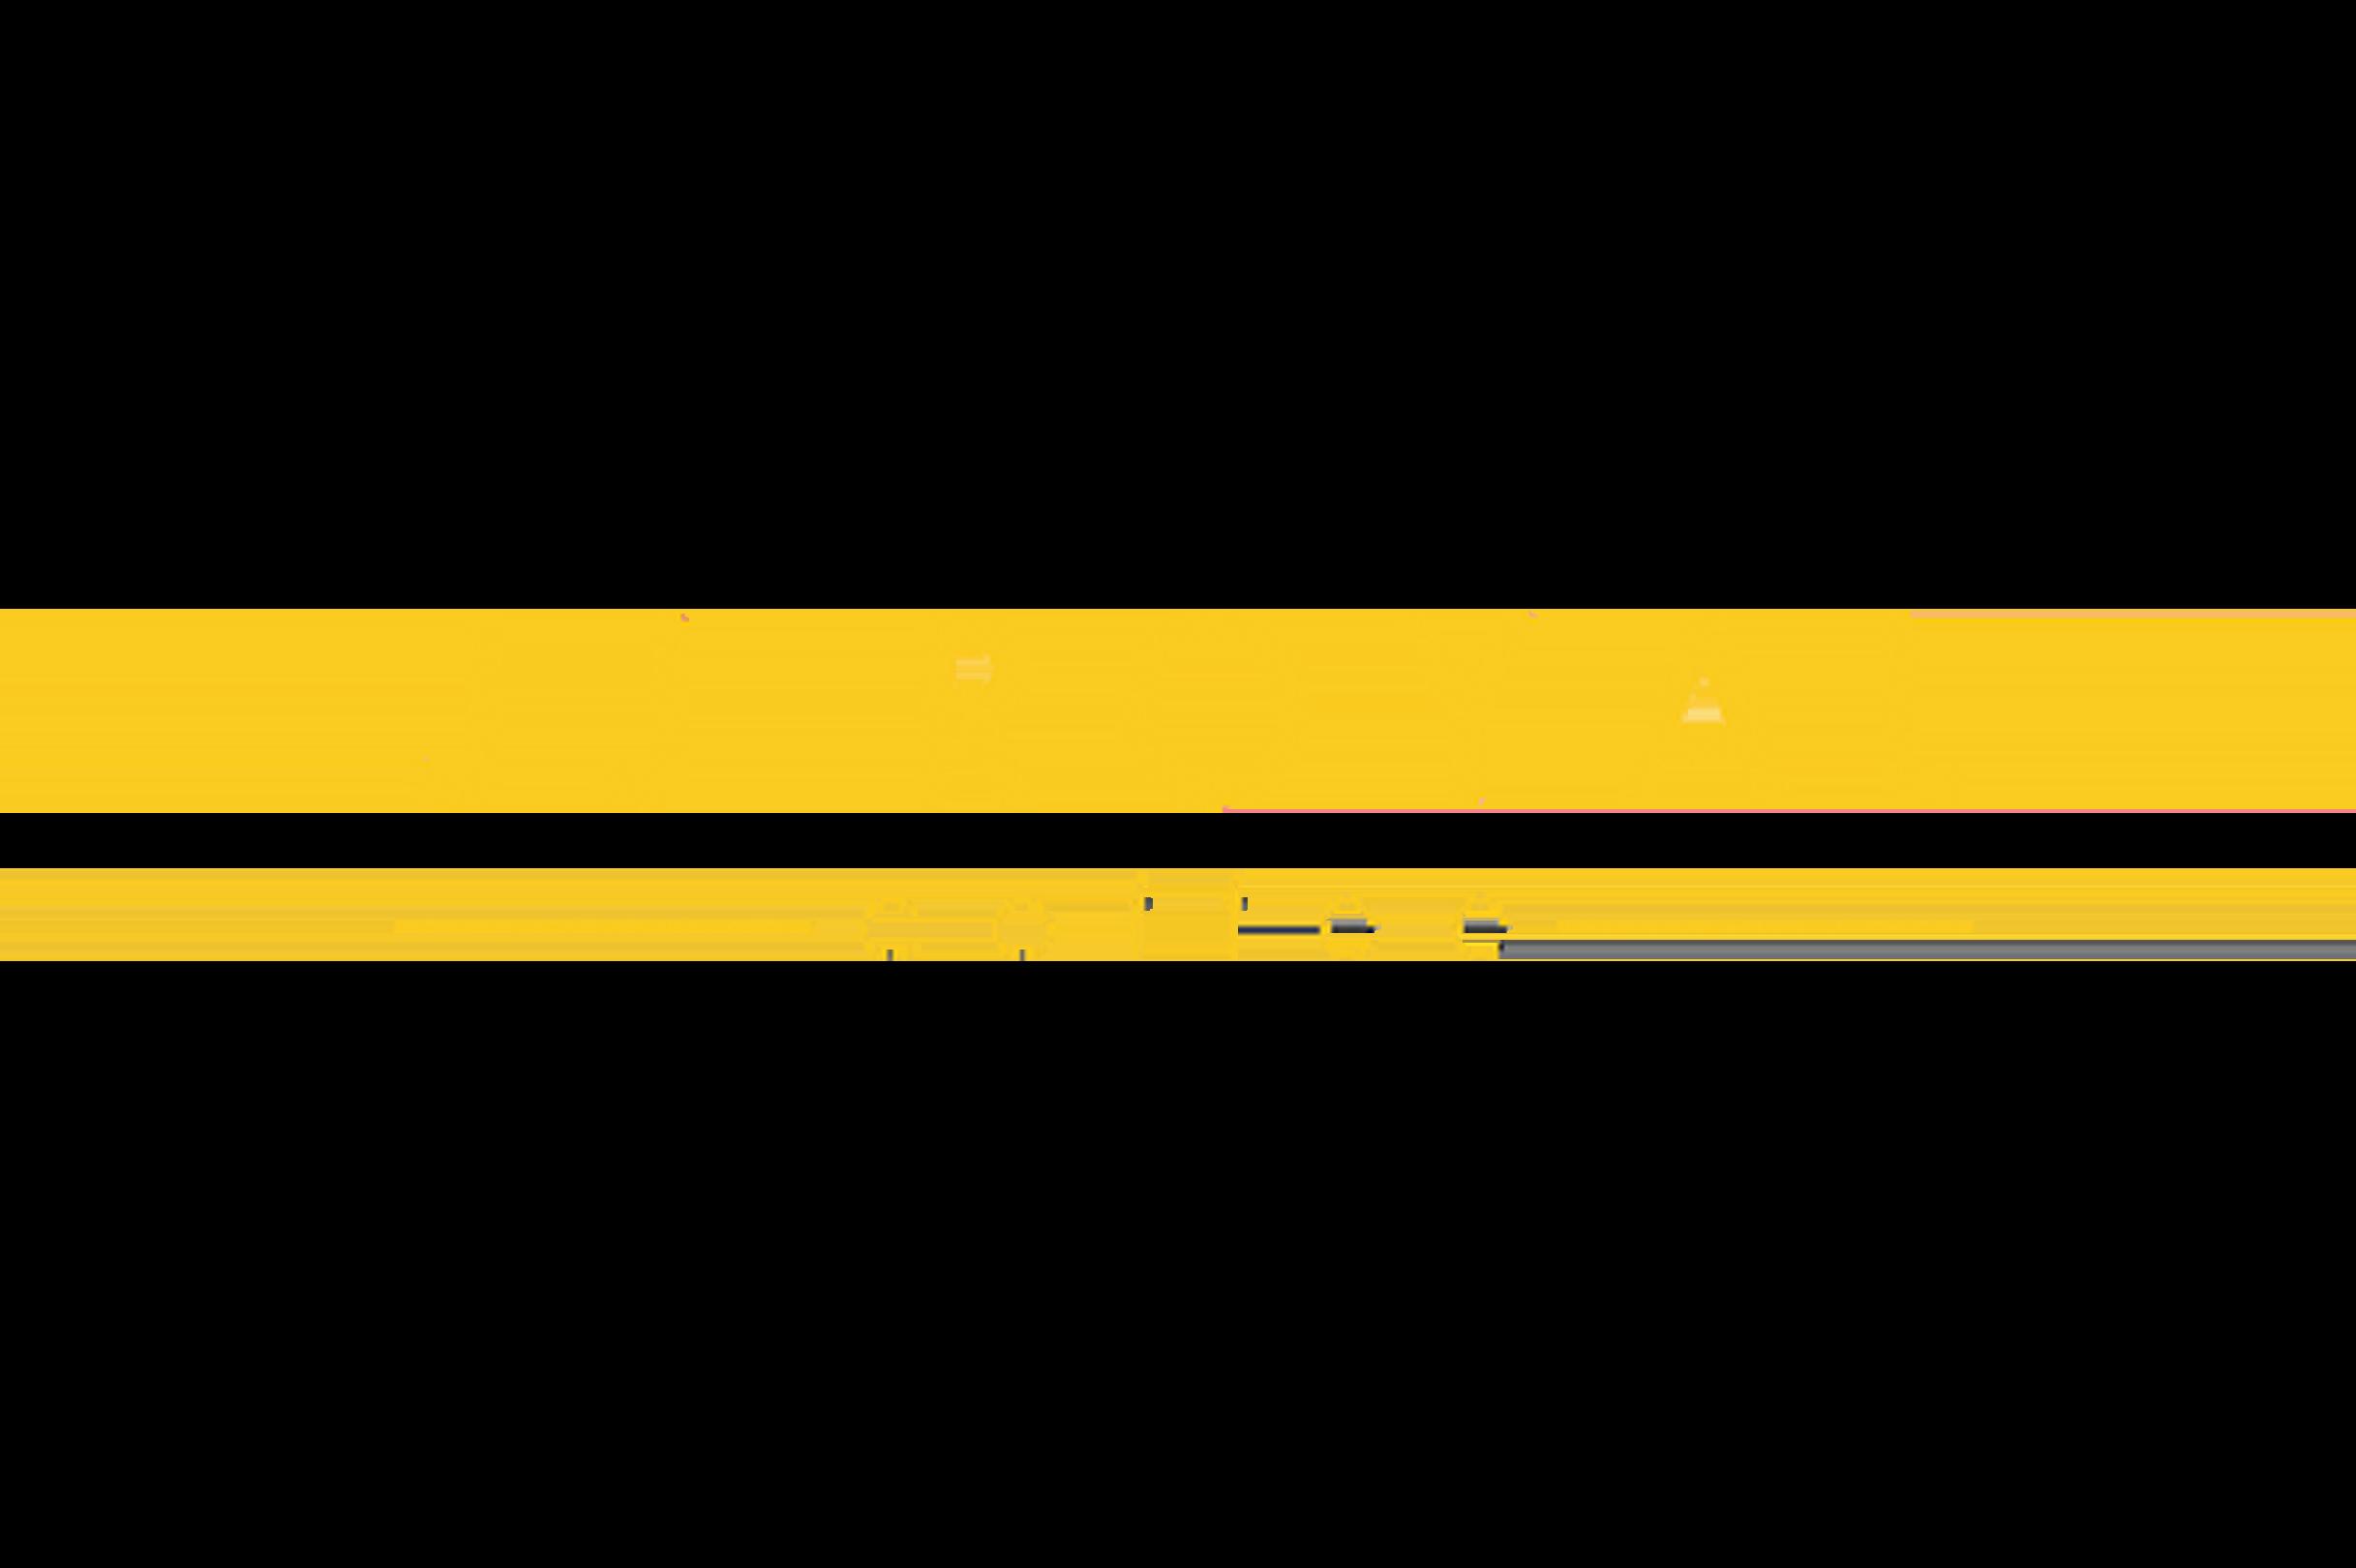 jjroyalcoffee